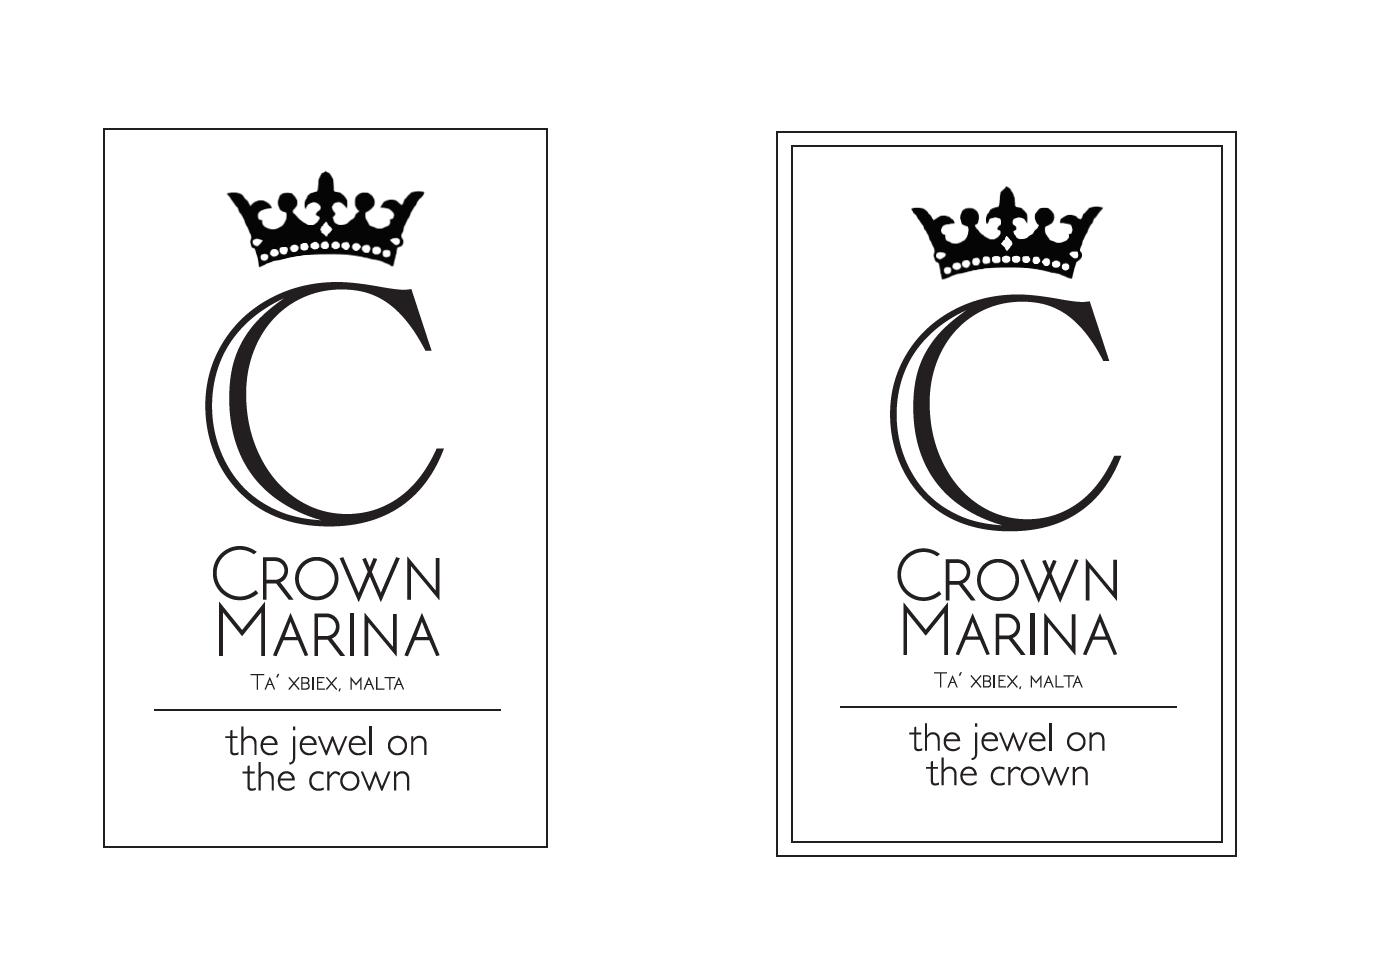 Crown Marina